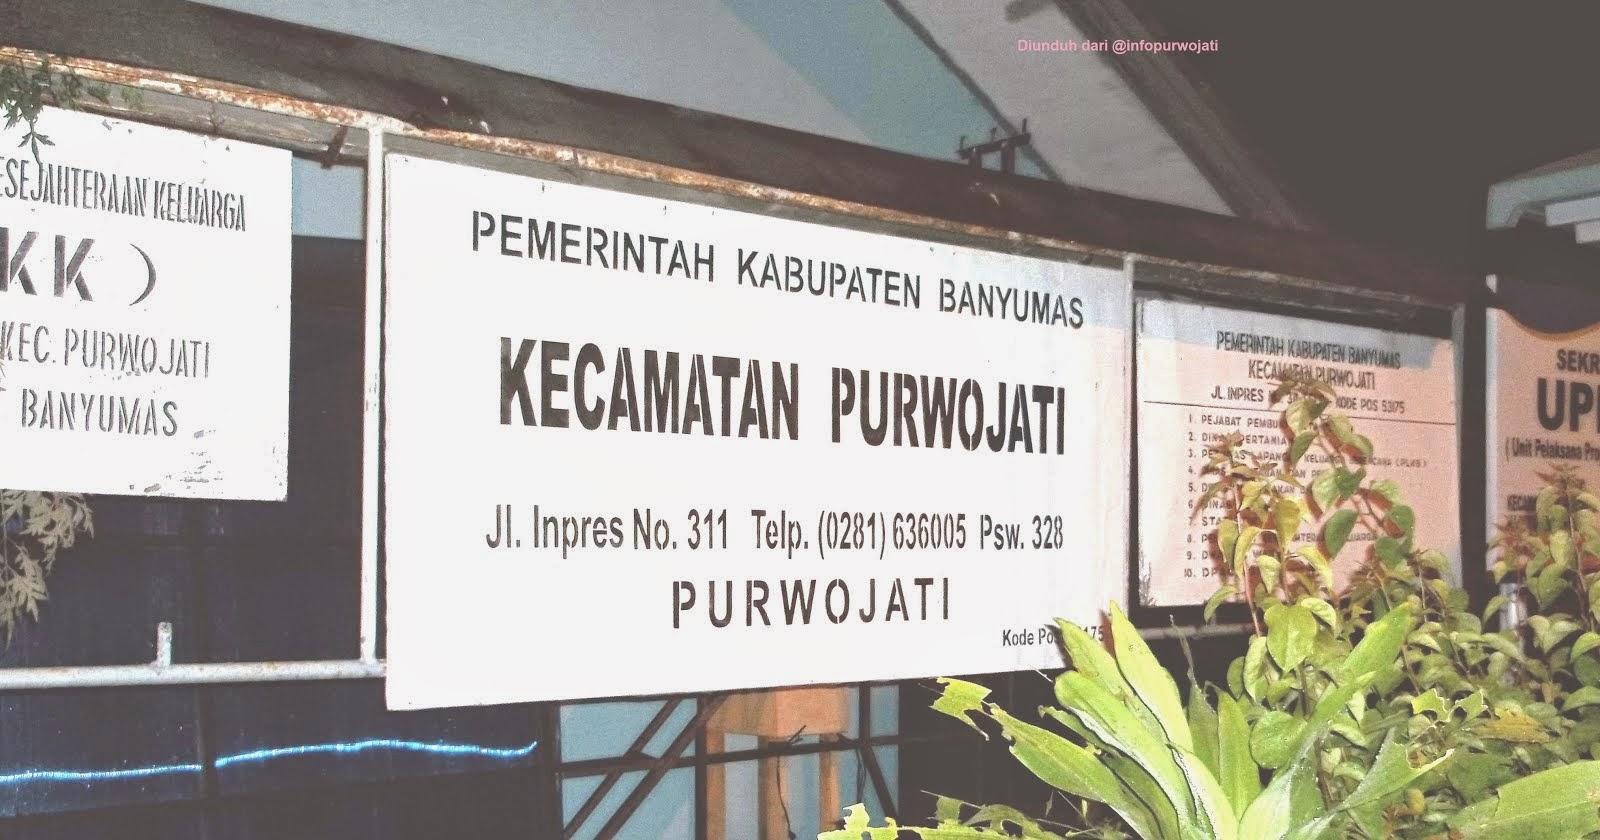 Kantor Kecamatan Purwojati